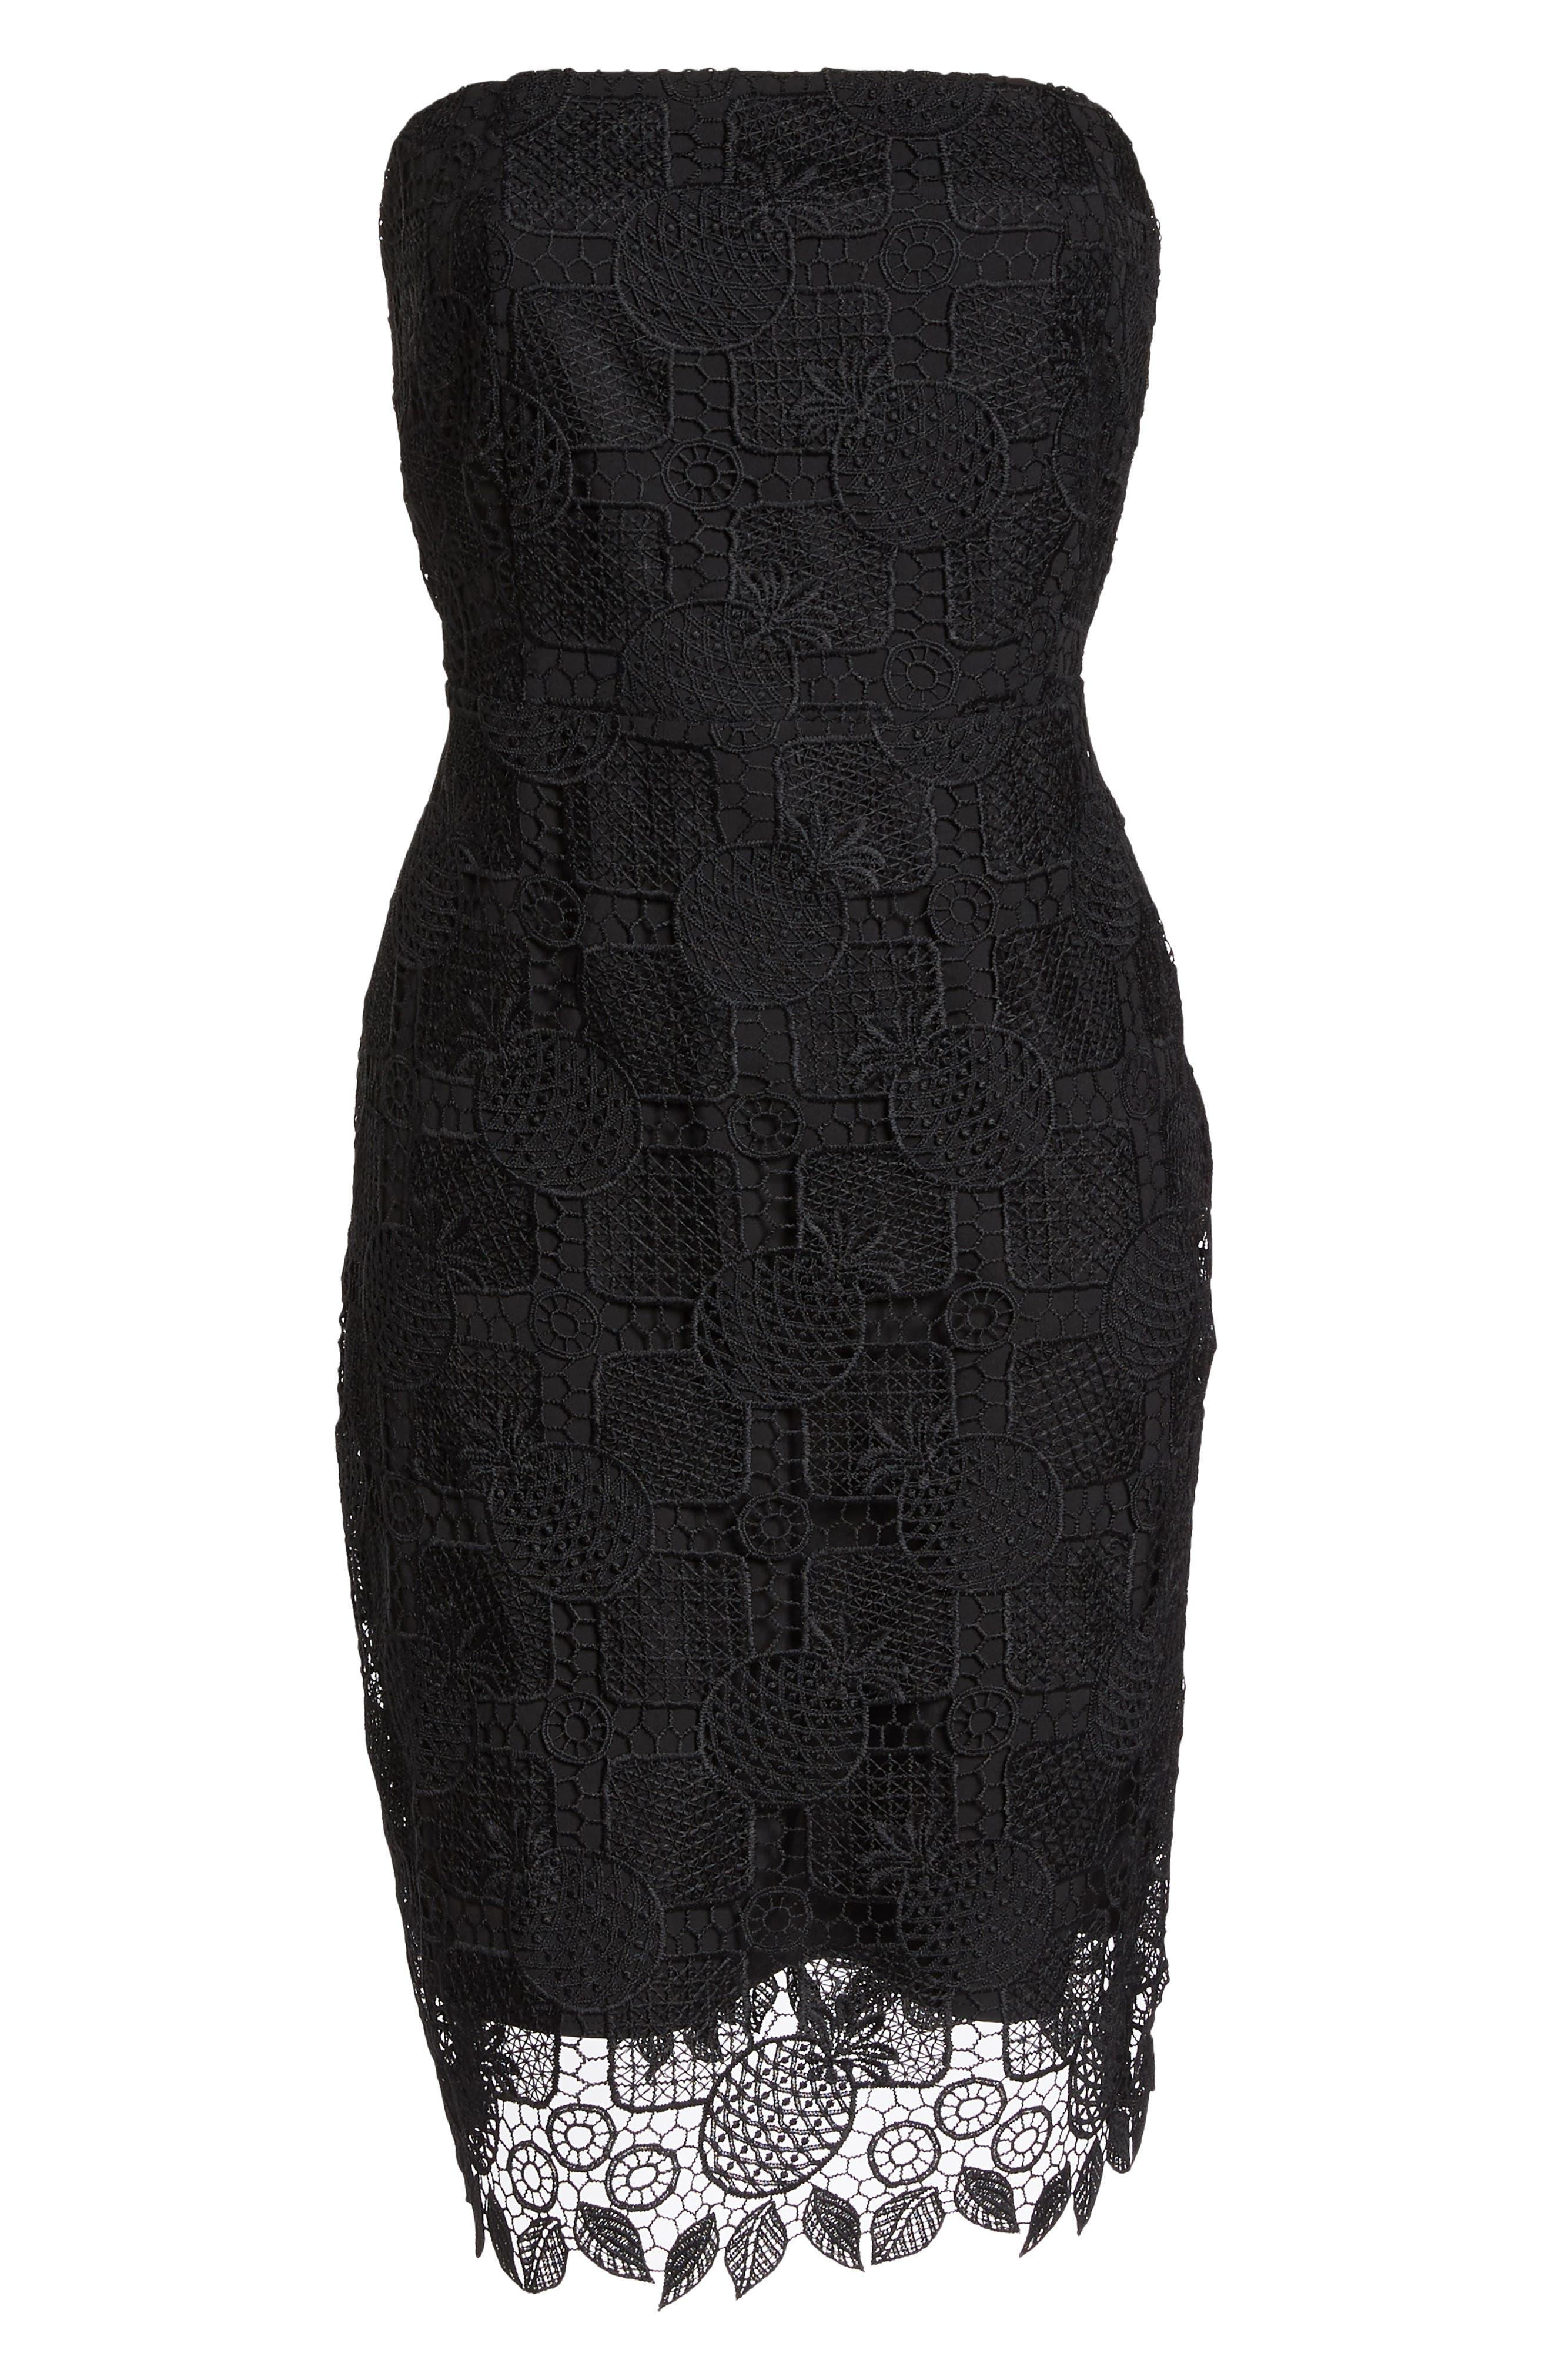 Strapless Lace Dress,                             Alternate thumbnail 6, color,                             Black